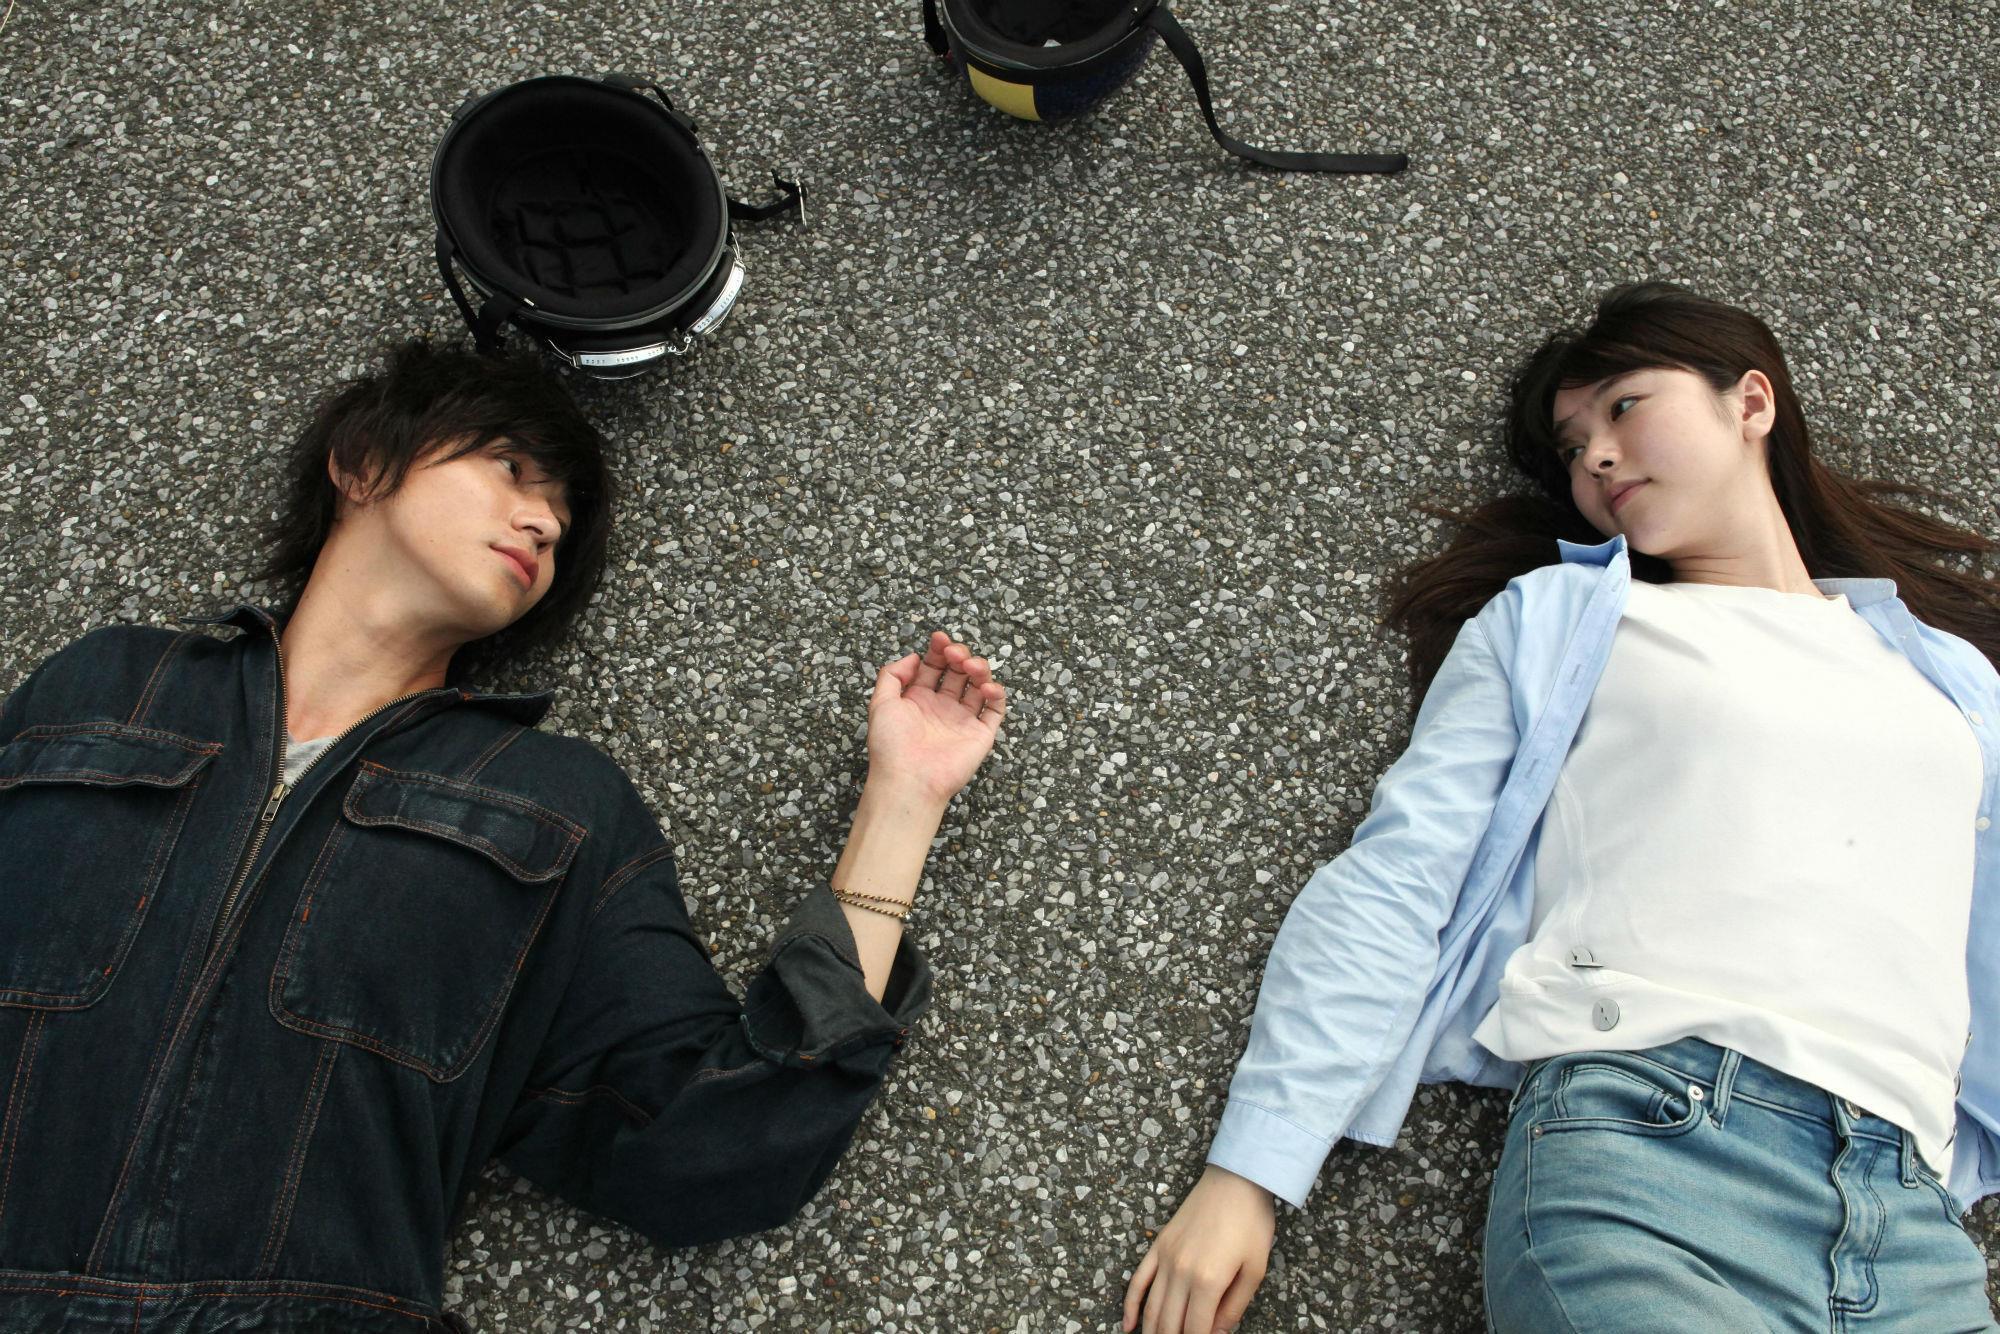 29. LIFFe: Asako I & II (Netemo sametemo)